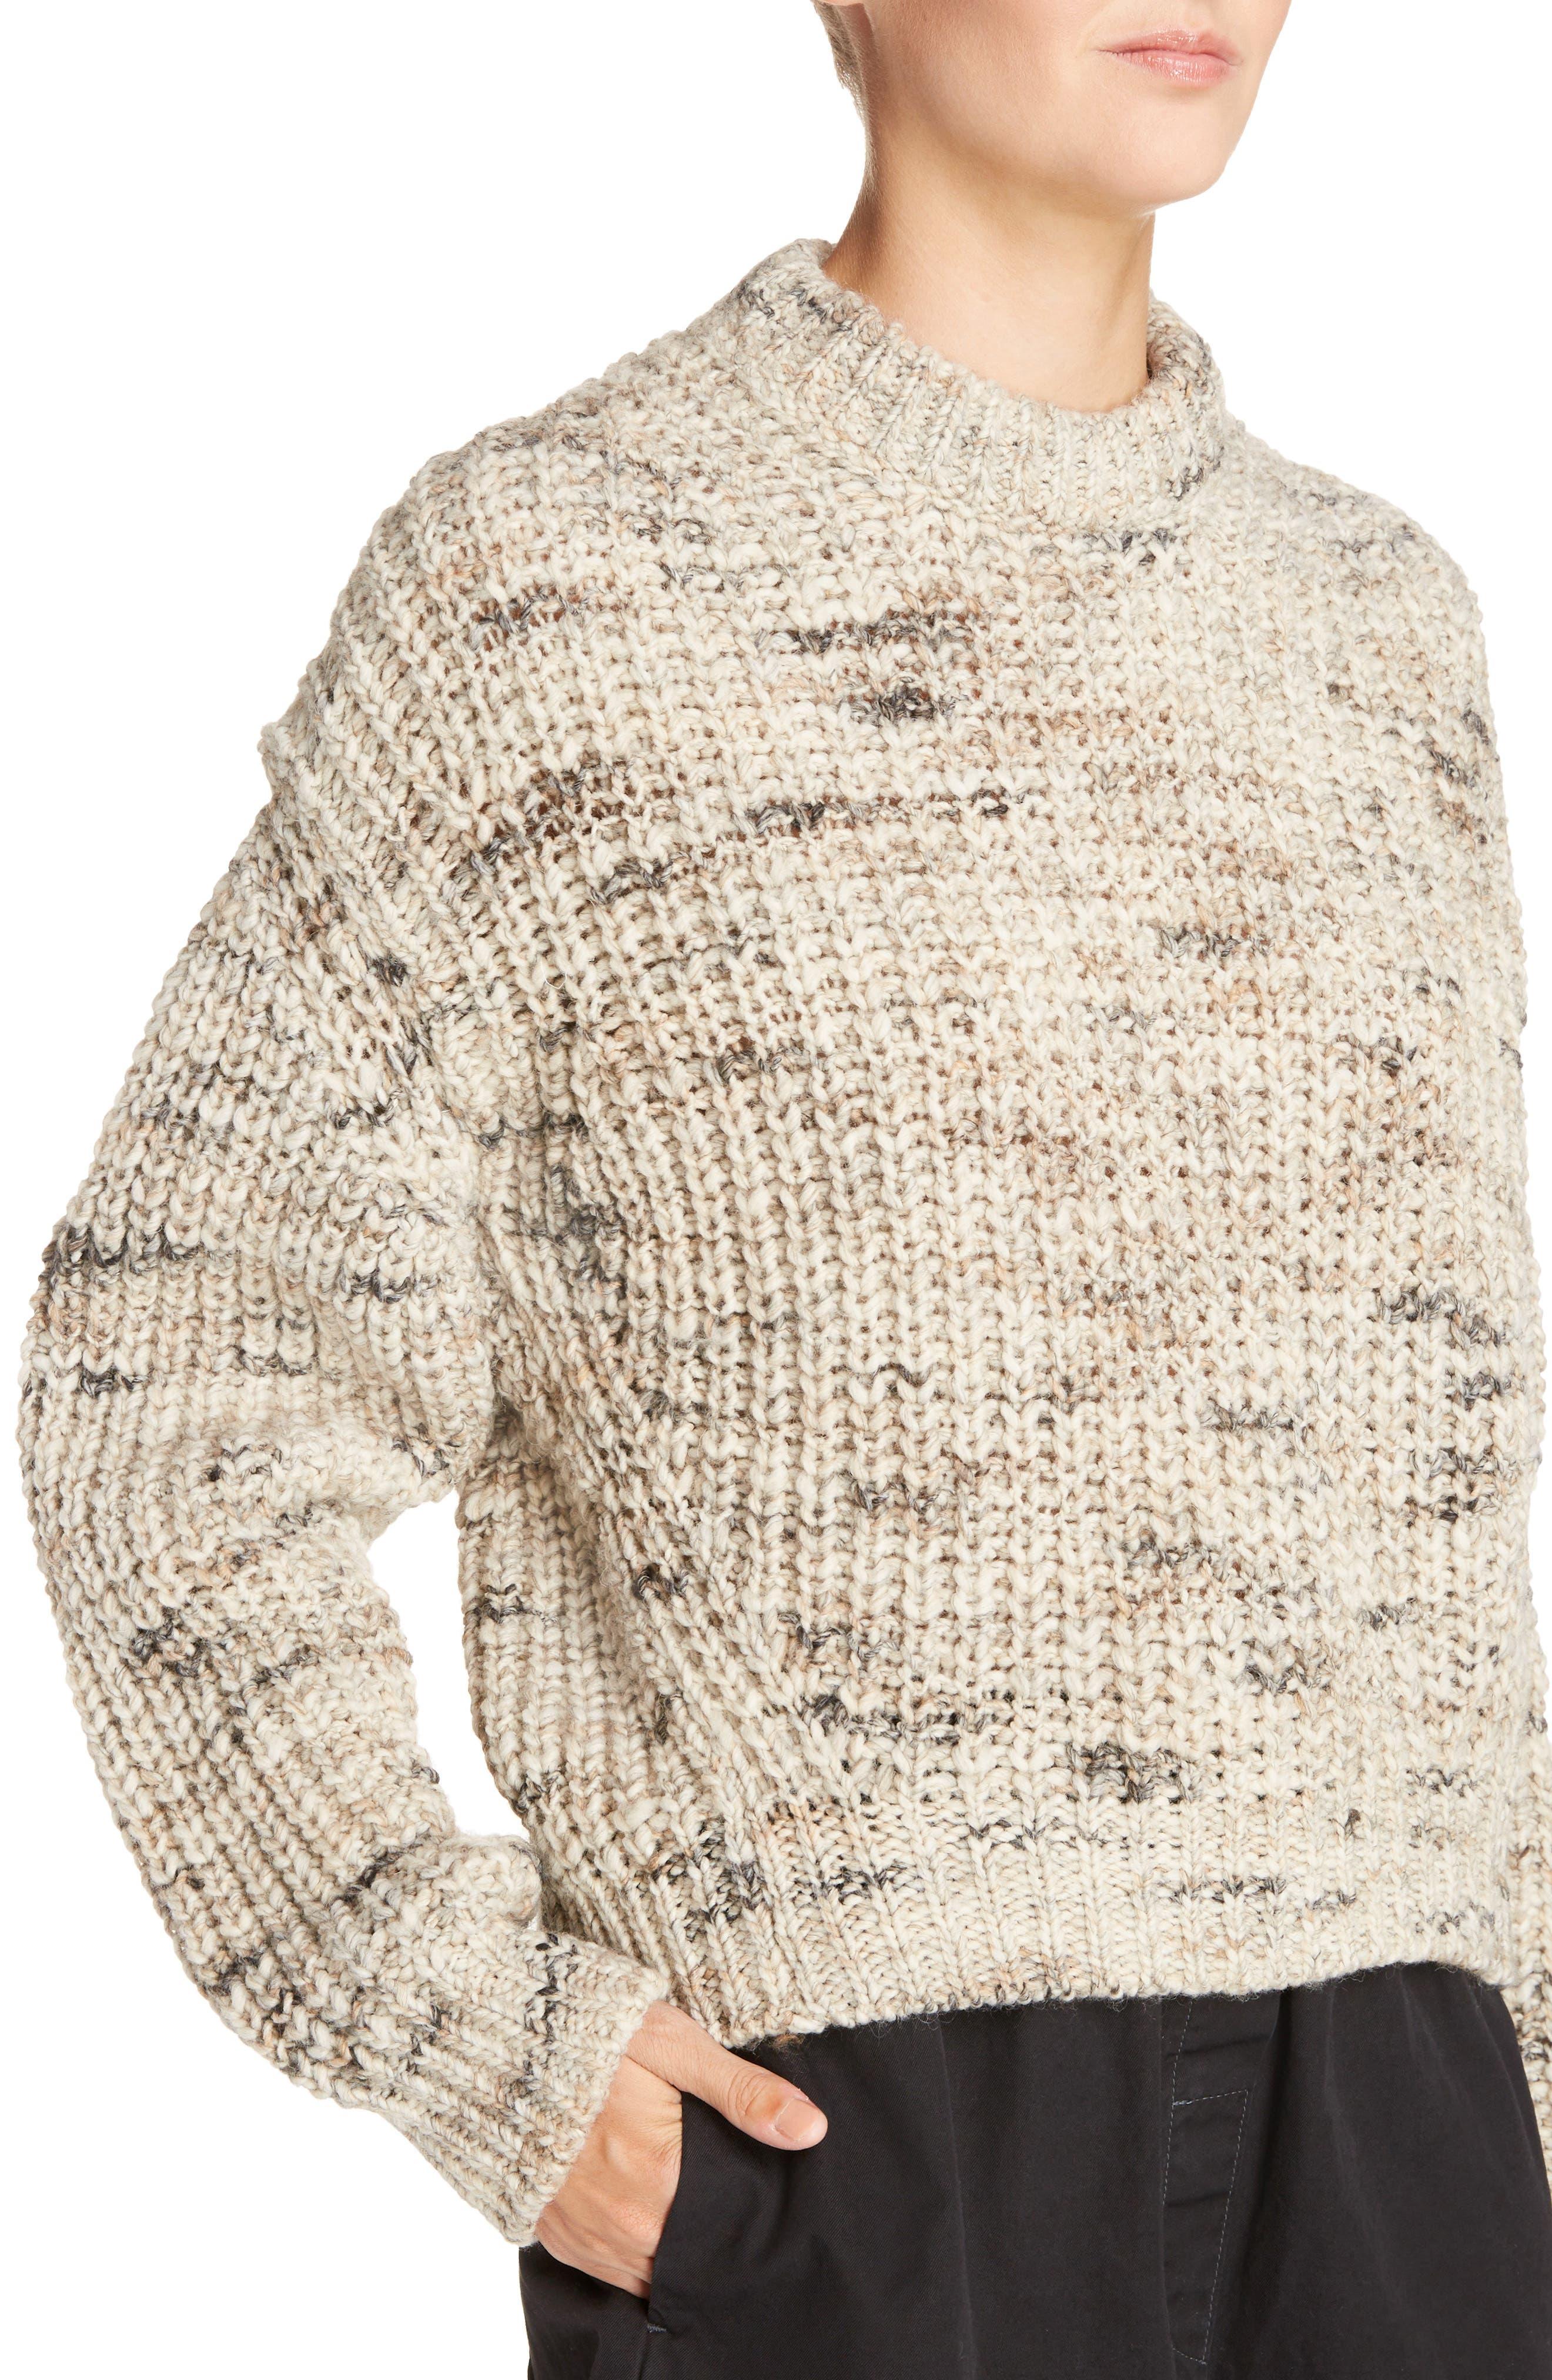 Zora Multi Sweater,                             Alternate thumbnail 4, color,                             White Mix